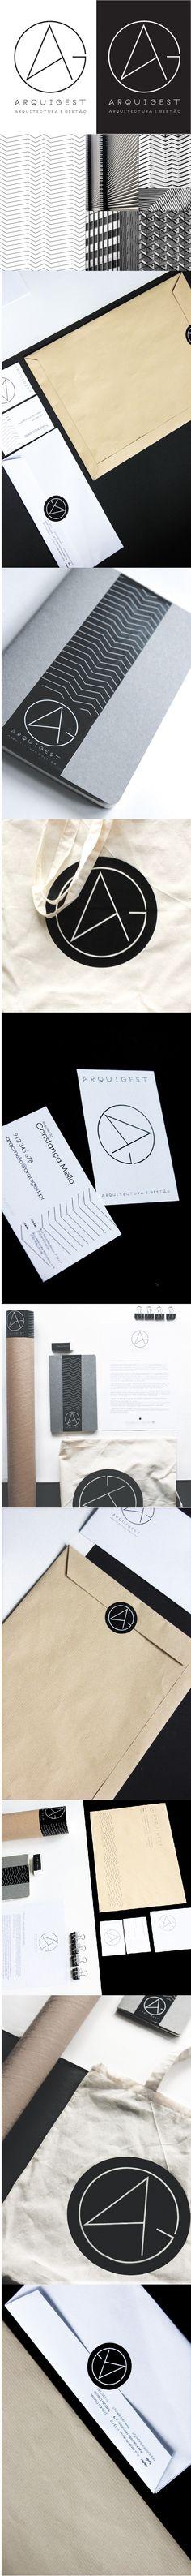 "Check out new work on my @Behance portfolio: ""Branding Arquigest // Atelier de Arquitectura"" http://on.be.net/1K1zL4J"